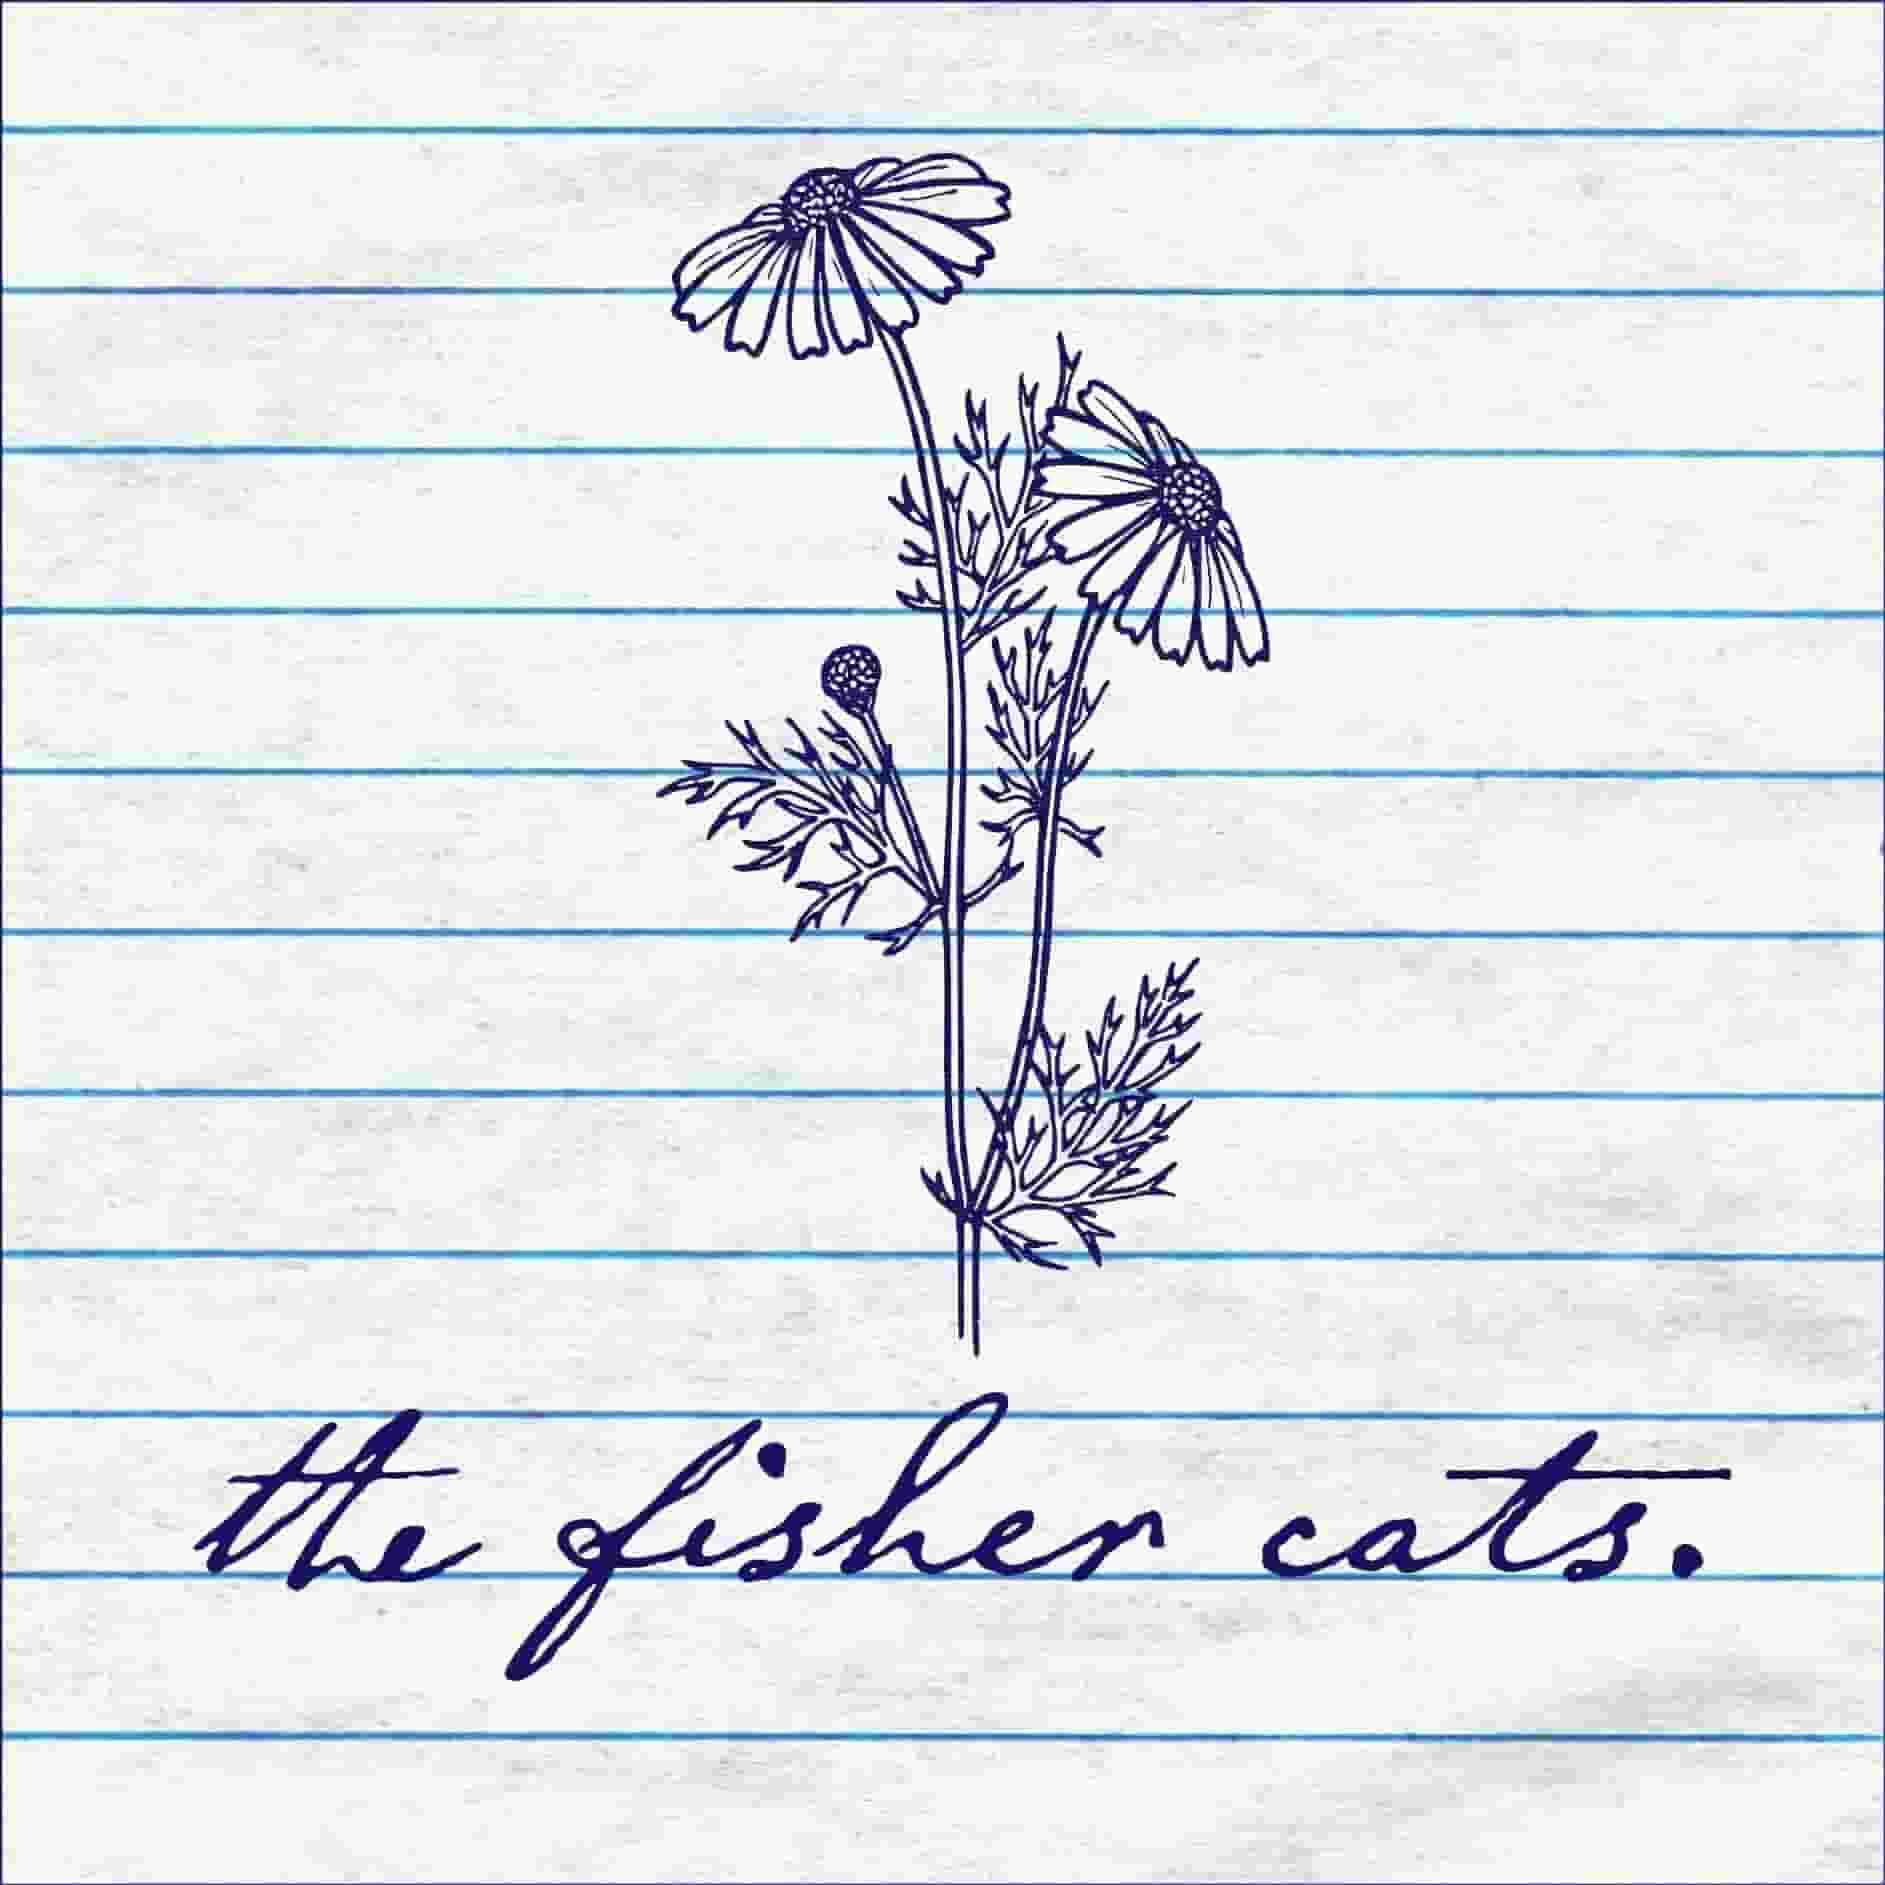 Debut Album Cover (February 2020)